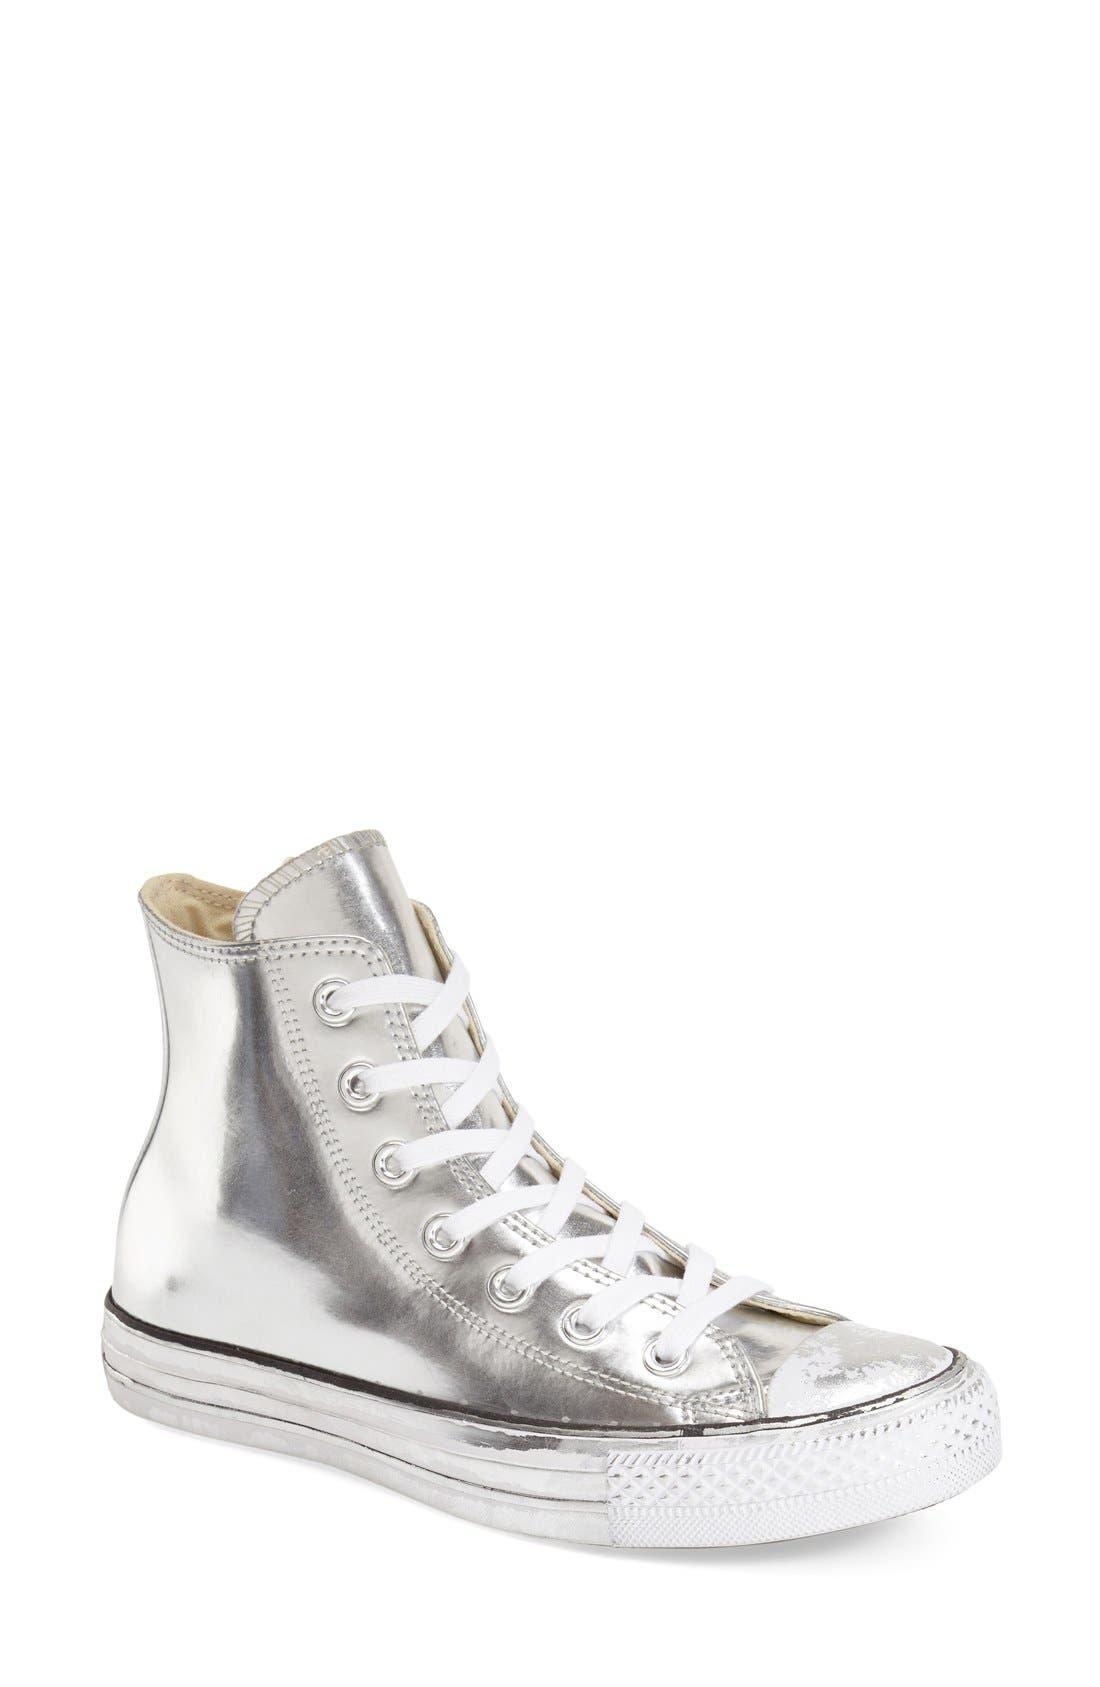 Alternate Image 1 Selected - Converse Chuck Taylor® All Star® 'Metallic' High Top Sneaker (Women)